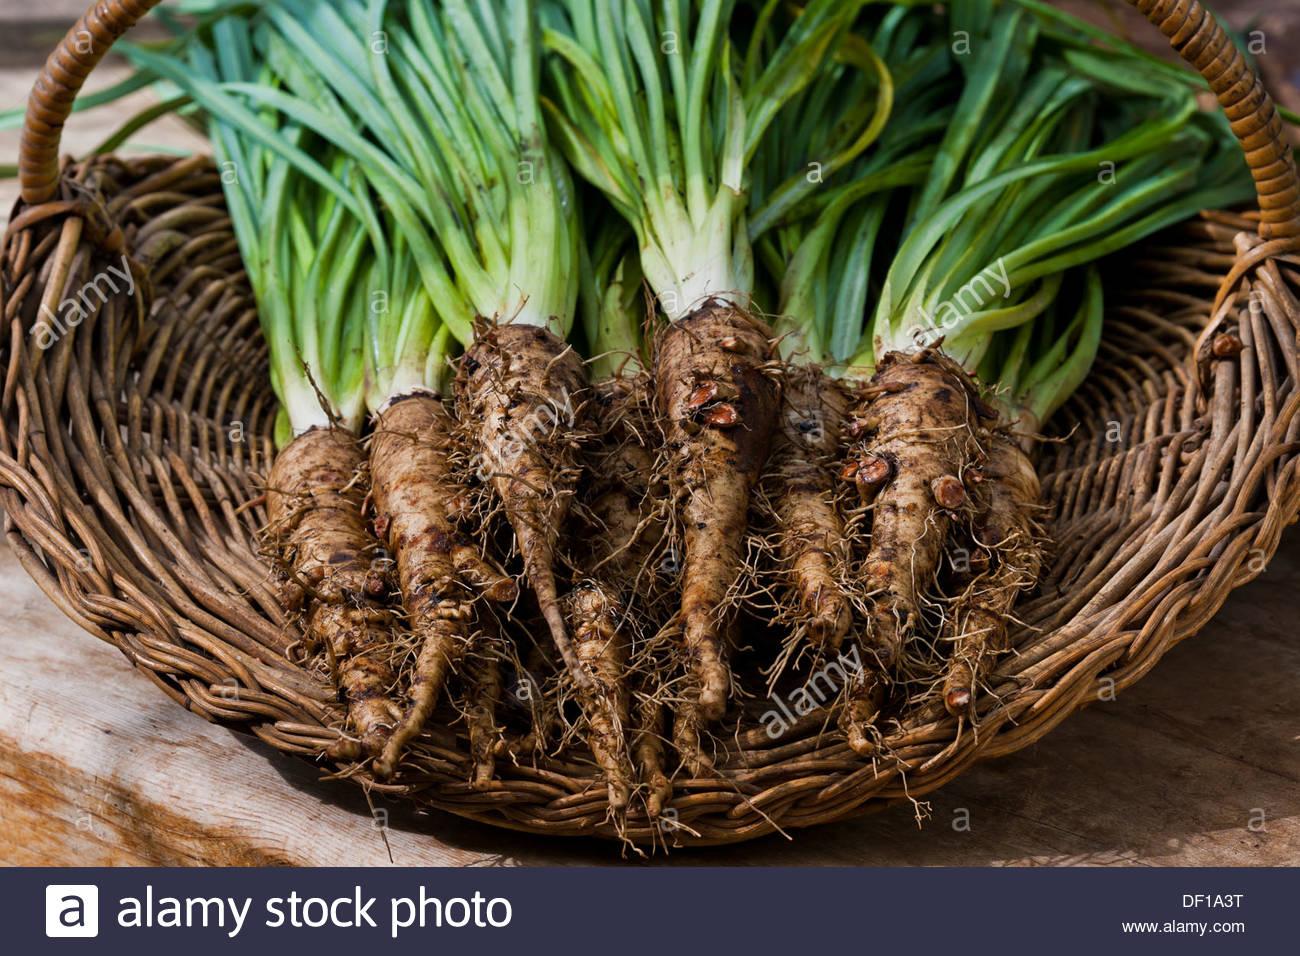 Salsify Tragopogon porrifolius Oyster plant gaotsbeard biennial root vegetable freshly harvested pulled home grown organic - Stock Image